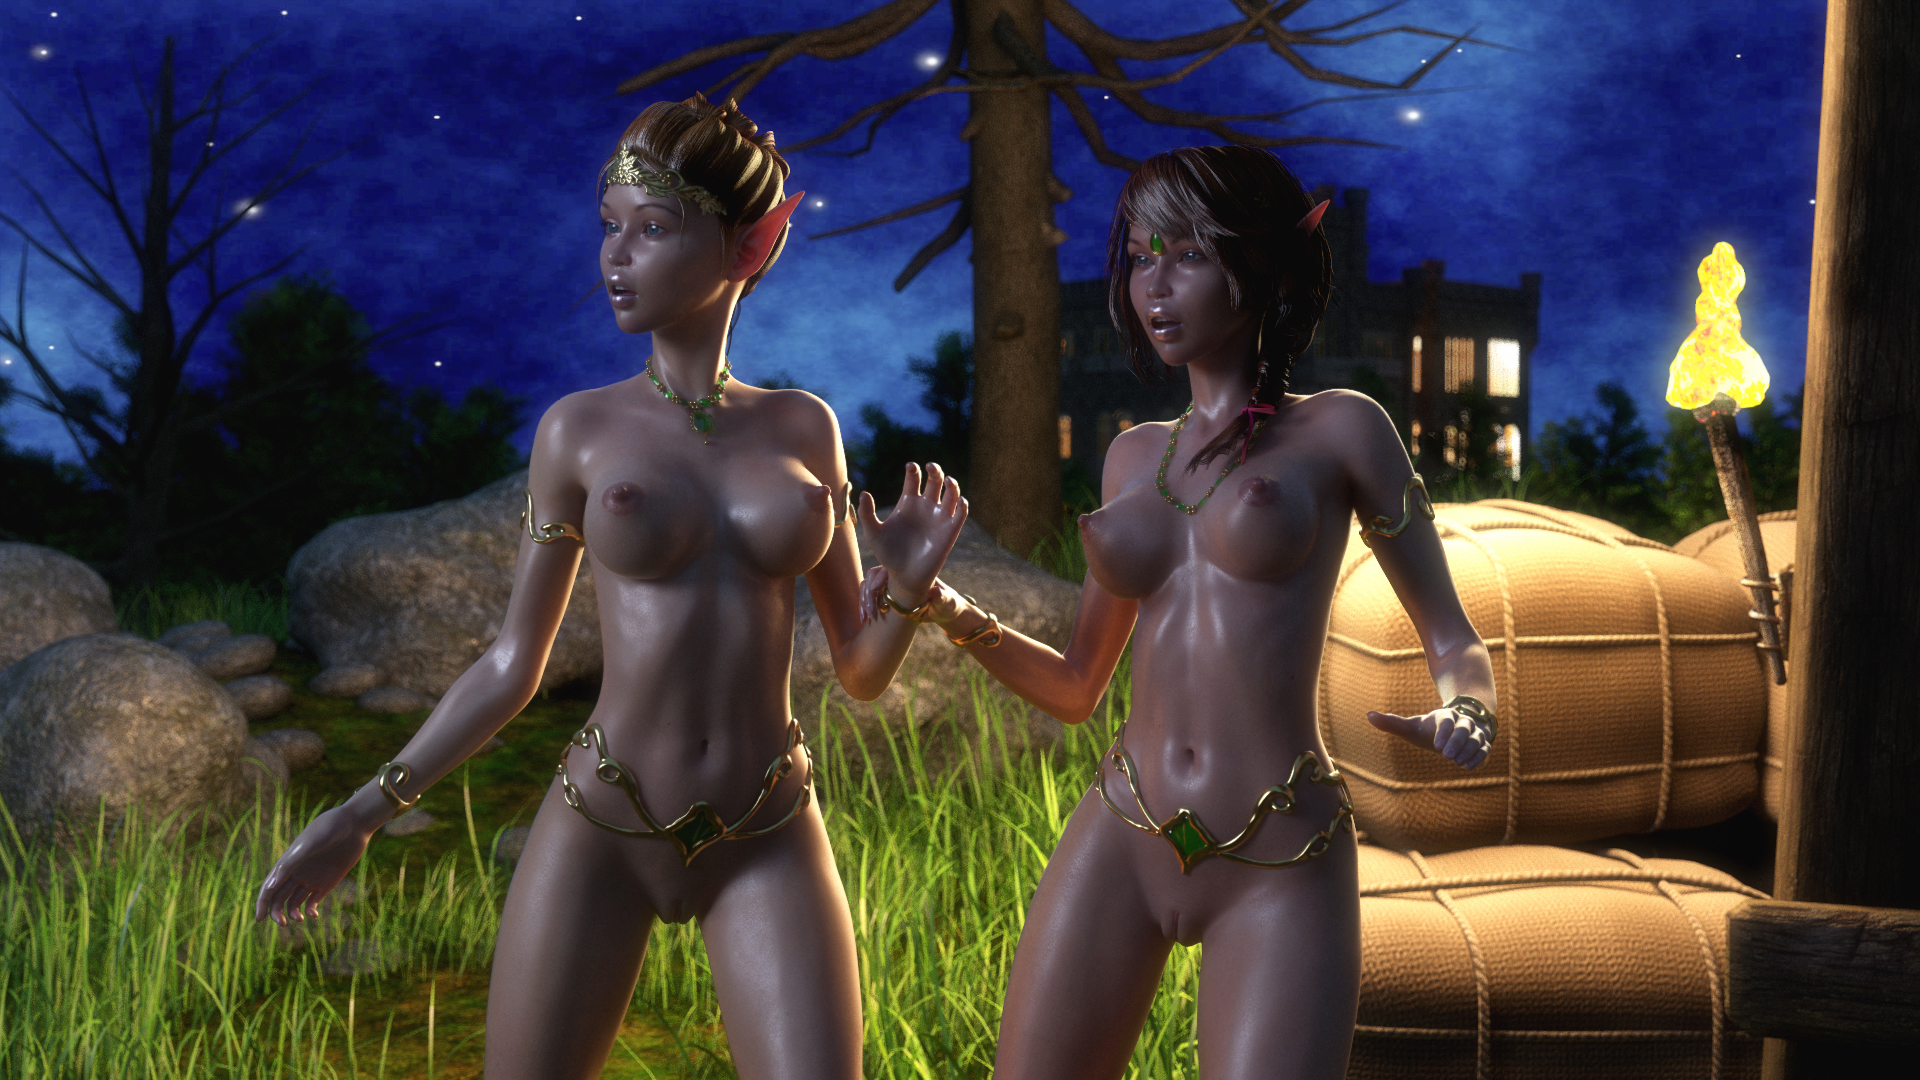 Erotic elf fiction nsfw video